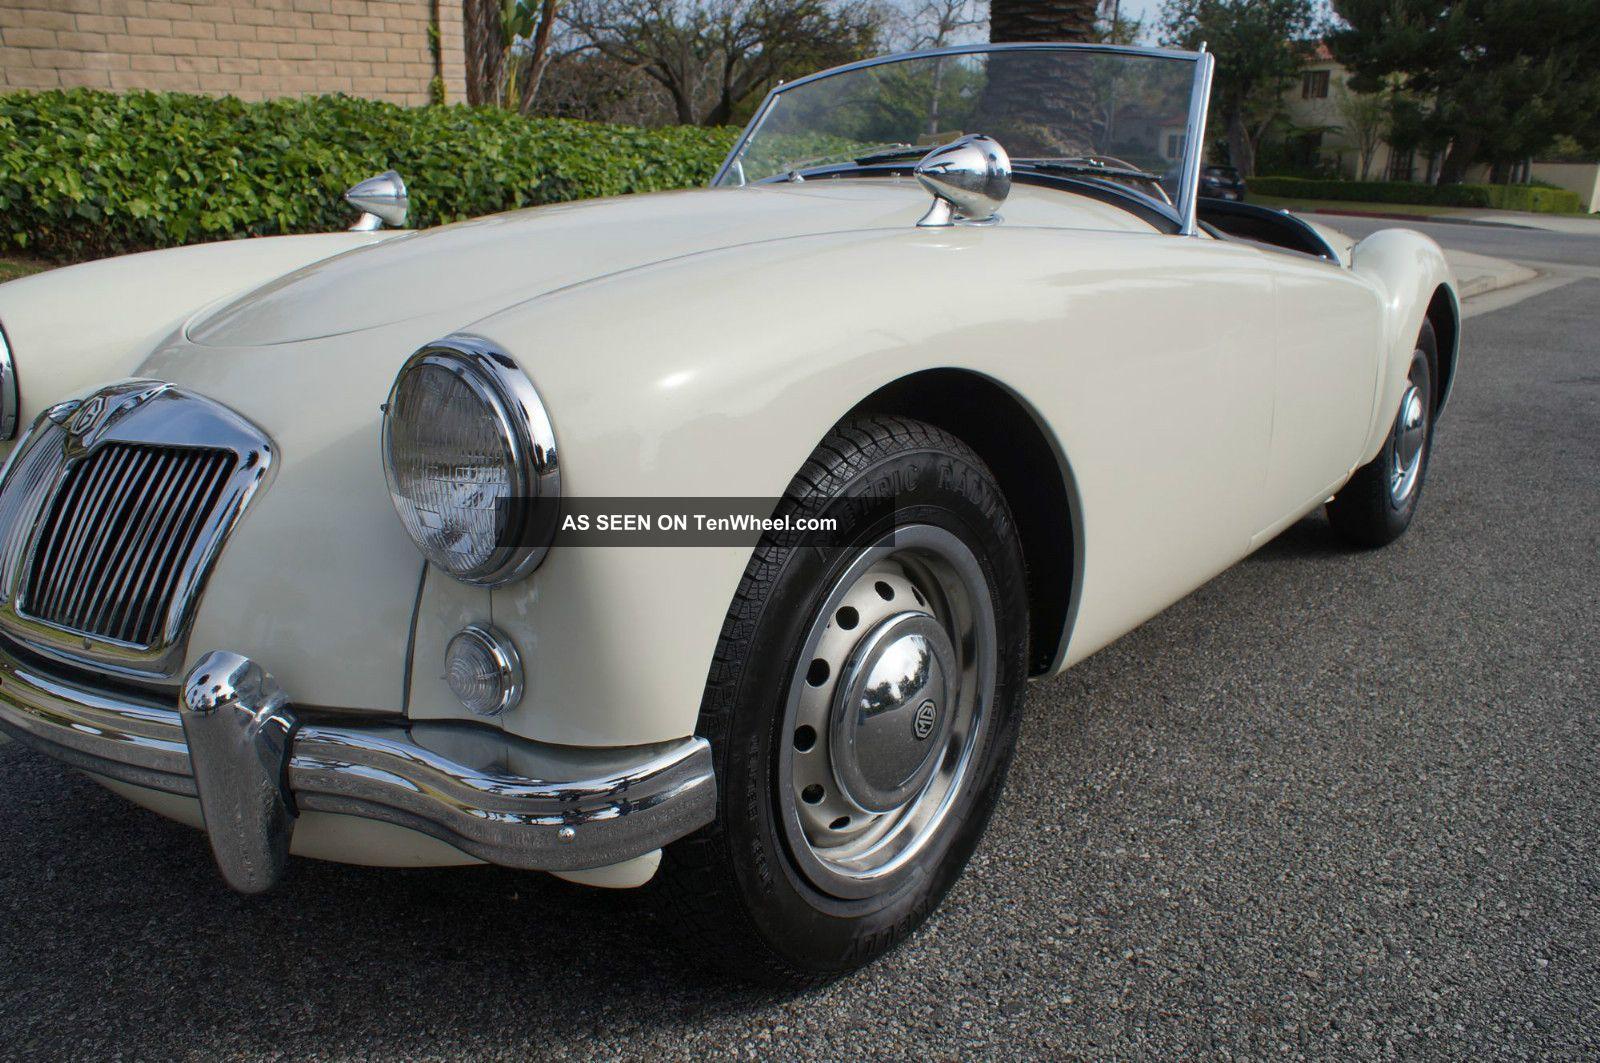 1958 Mga Rust California Classic British Sports Car Recent ...  1958 Mga Rust C...